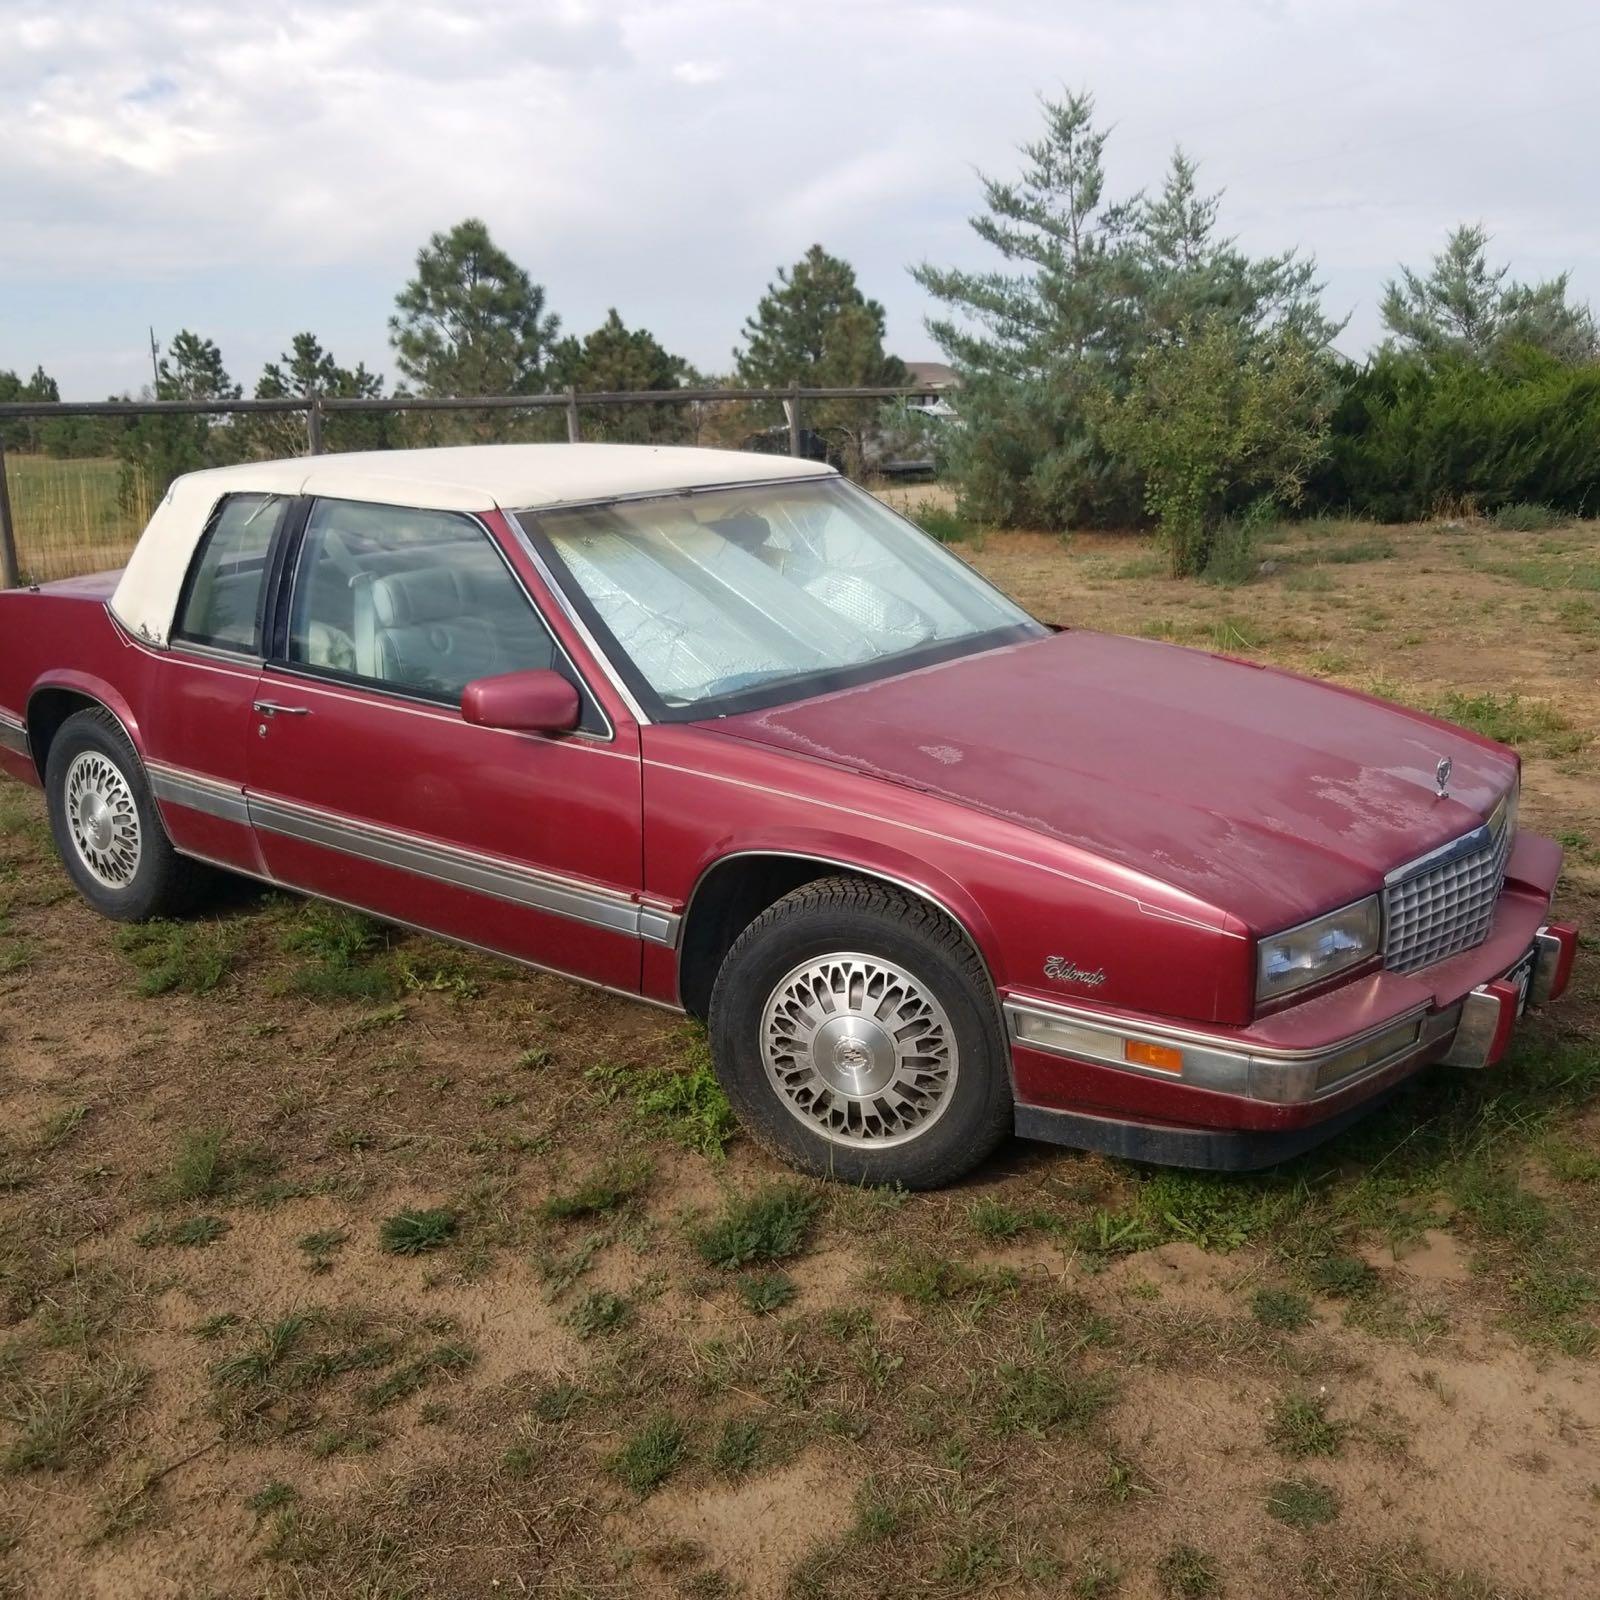 still taking bids - 1988 Cadillac Eldorado with 37,000 miles